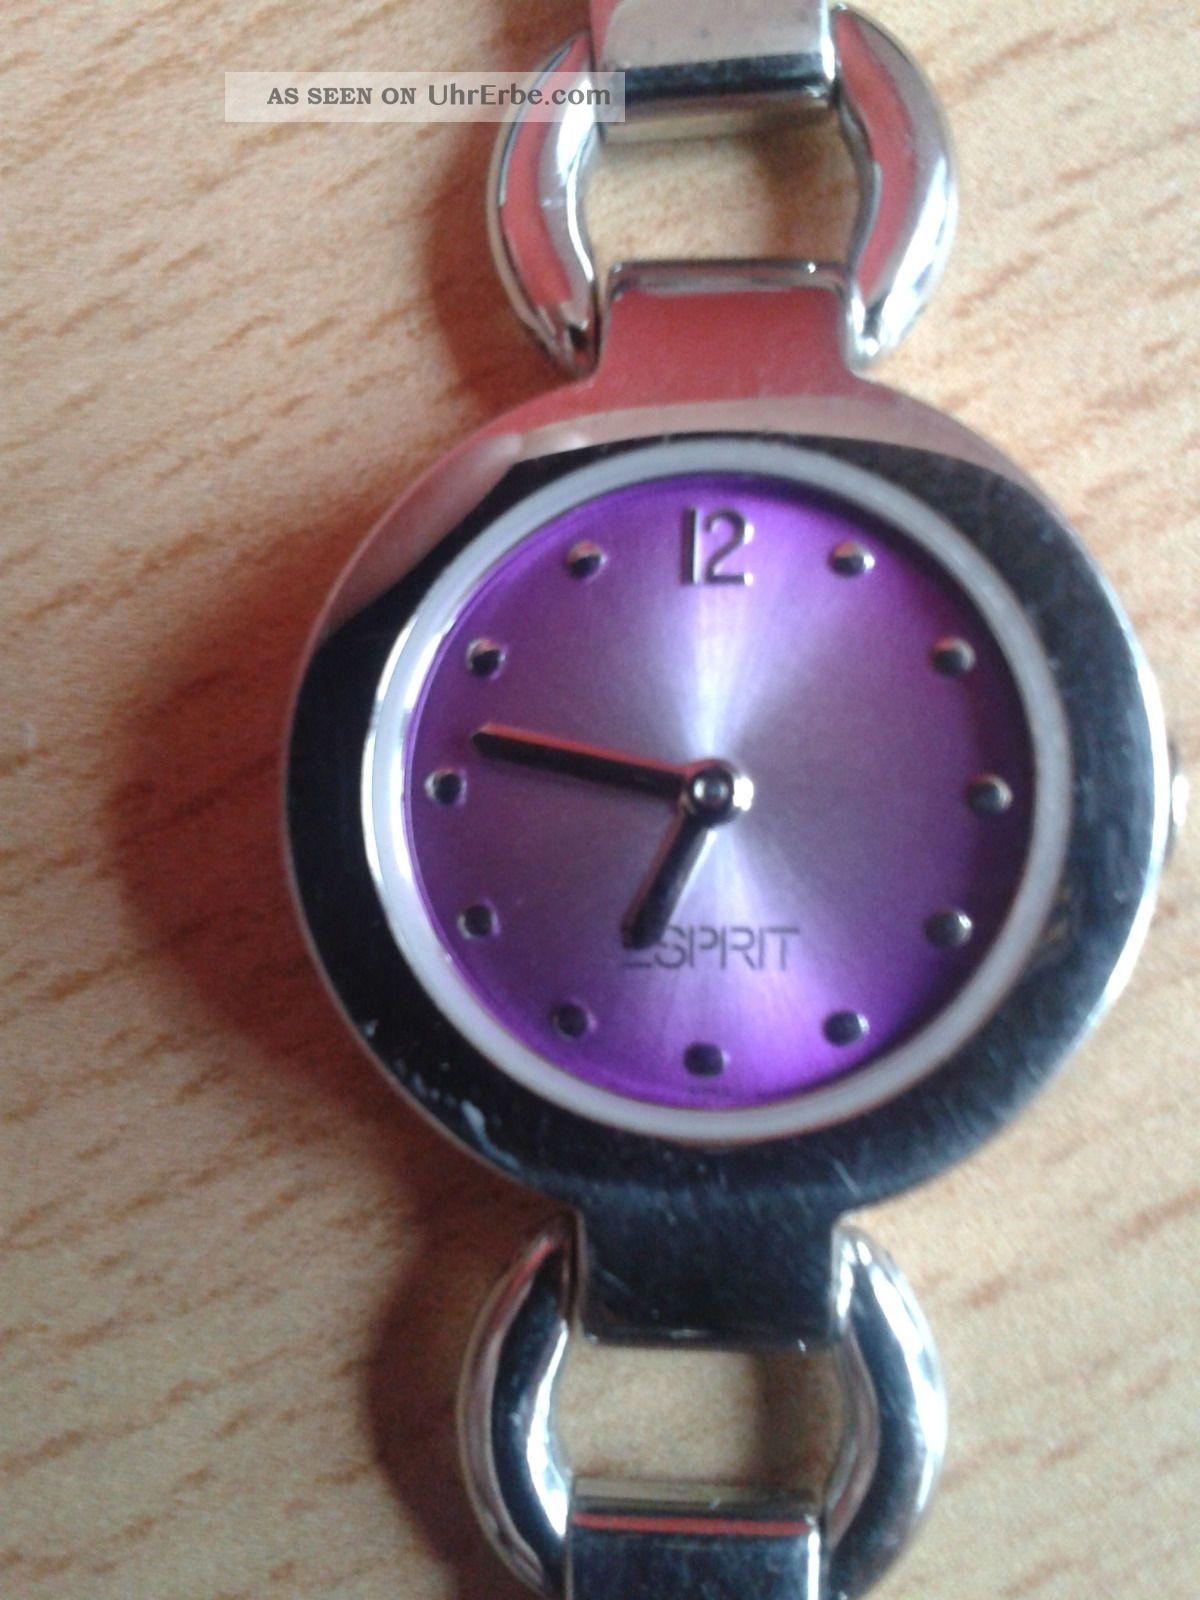 Uhr Esprit Armbanduhren Bild